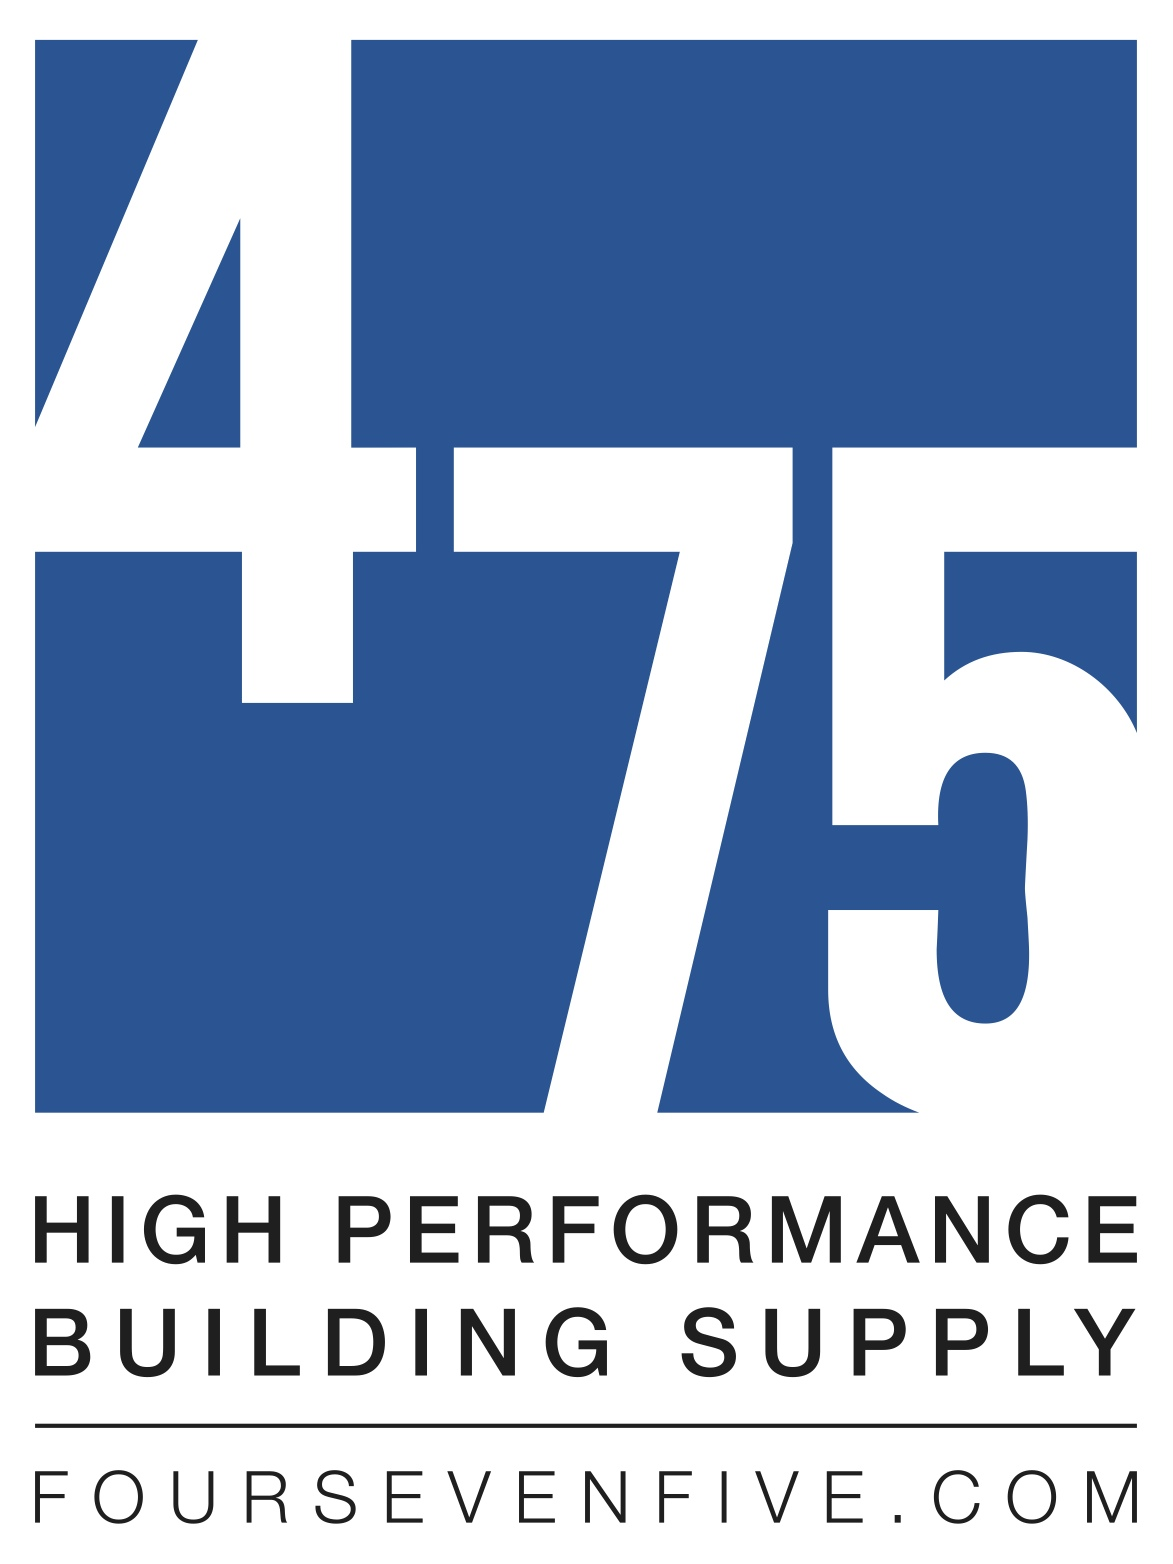 475_logo_vertical_USA.jpg